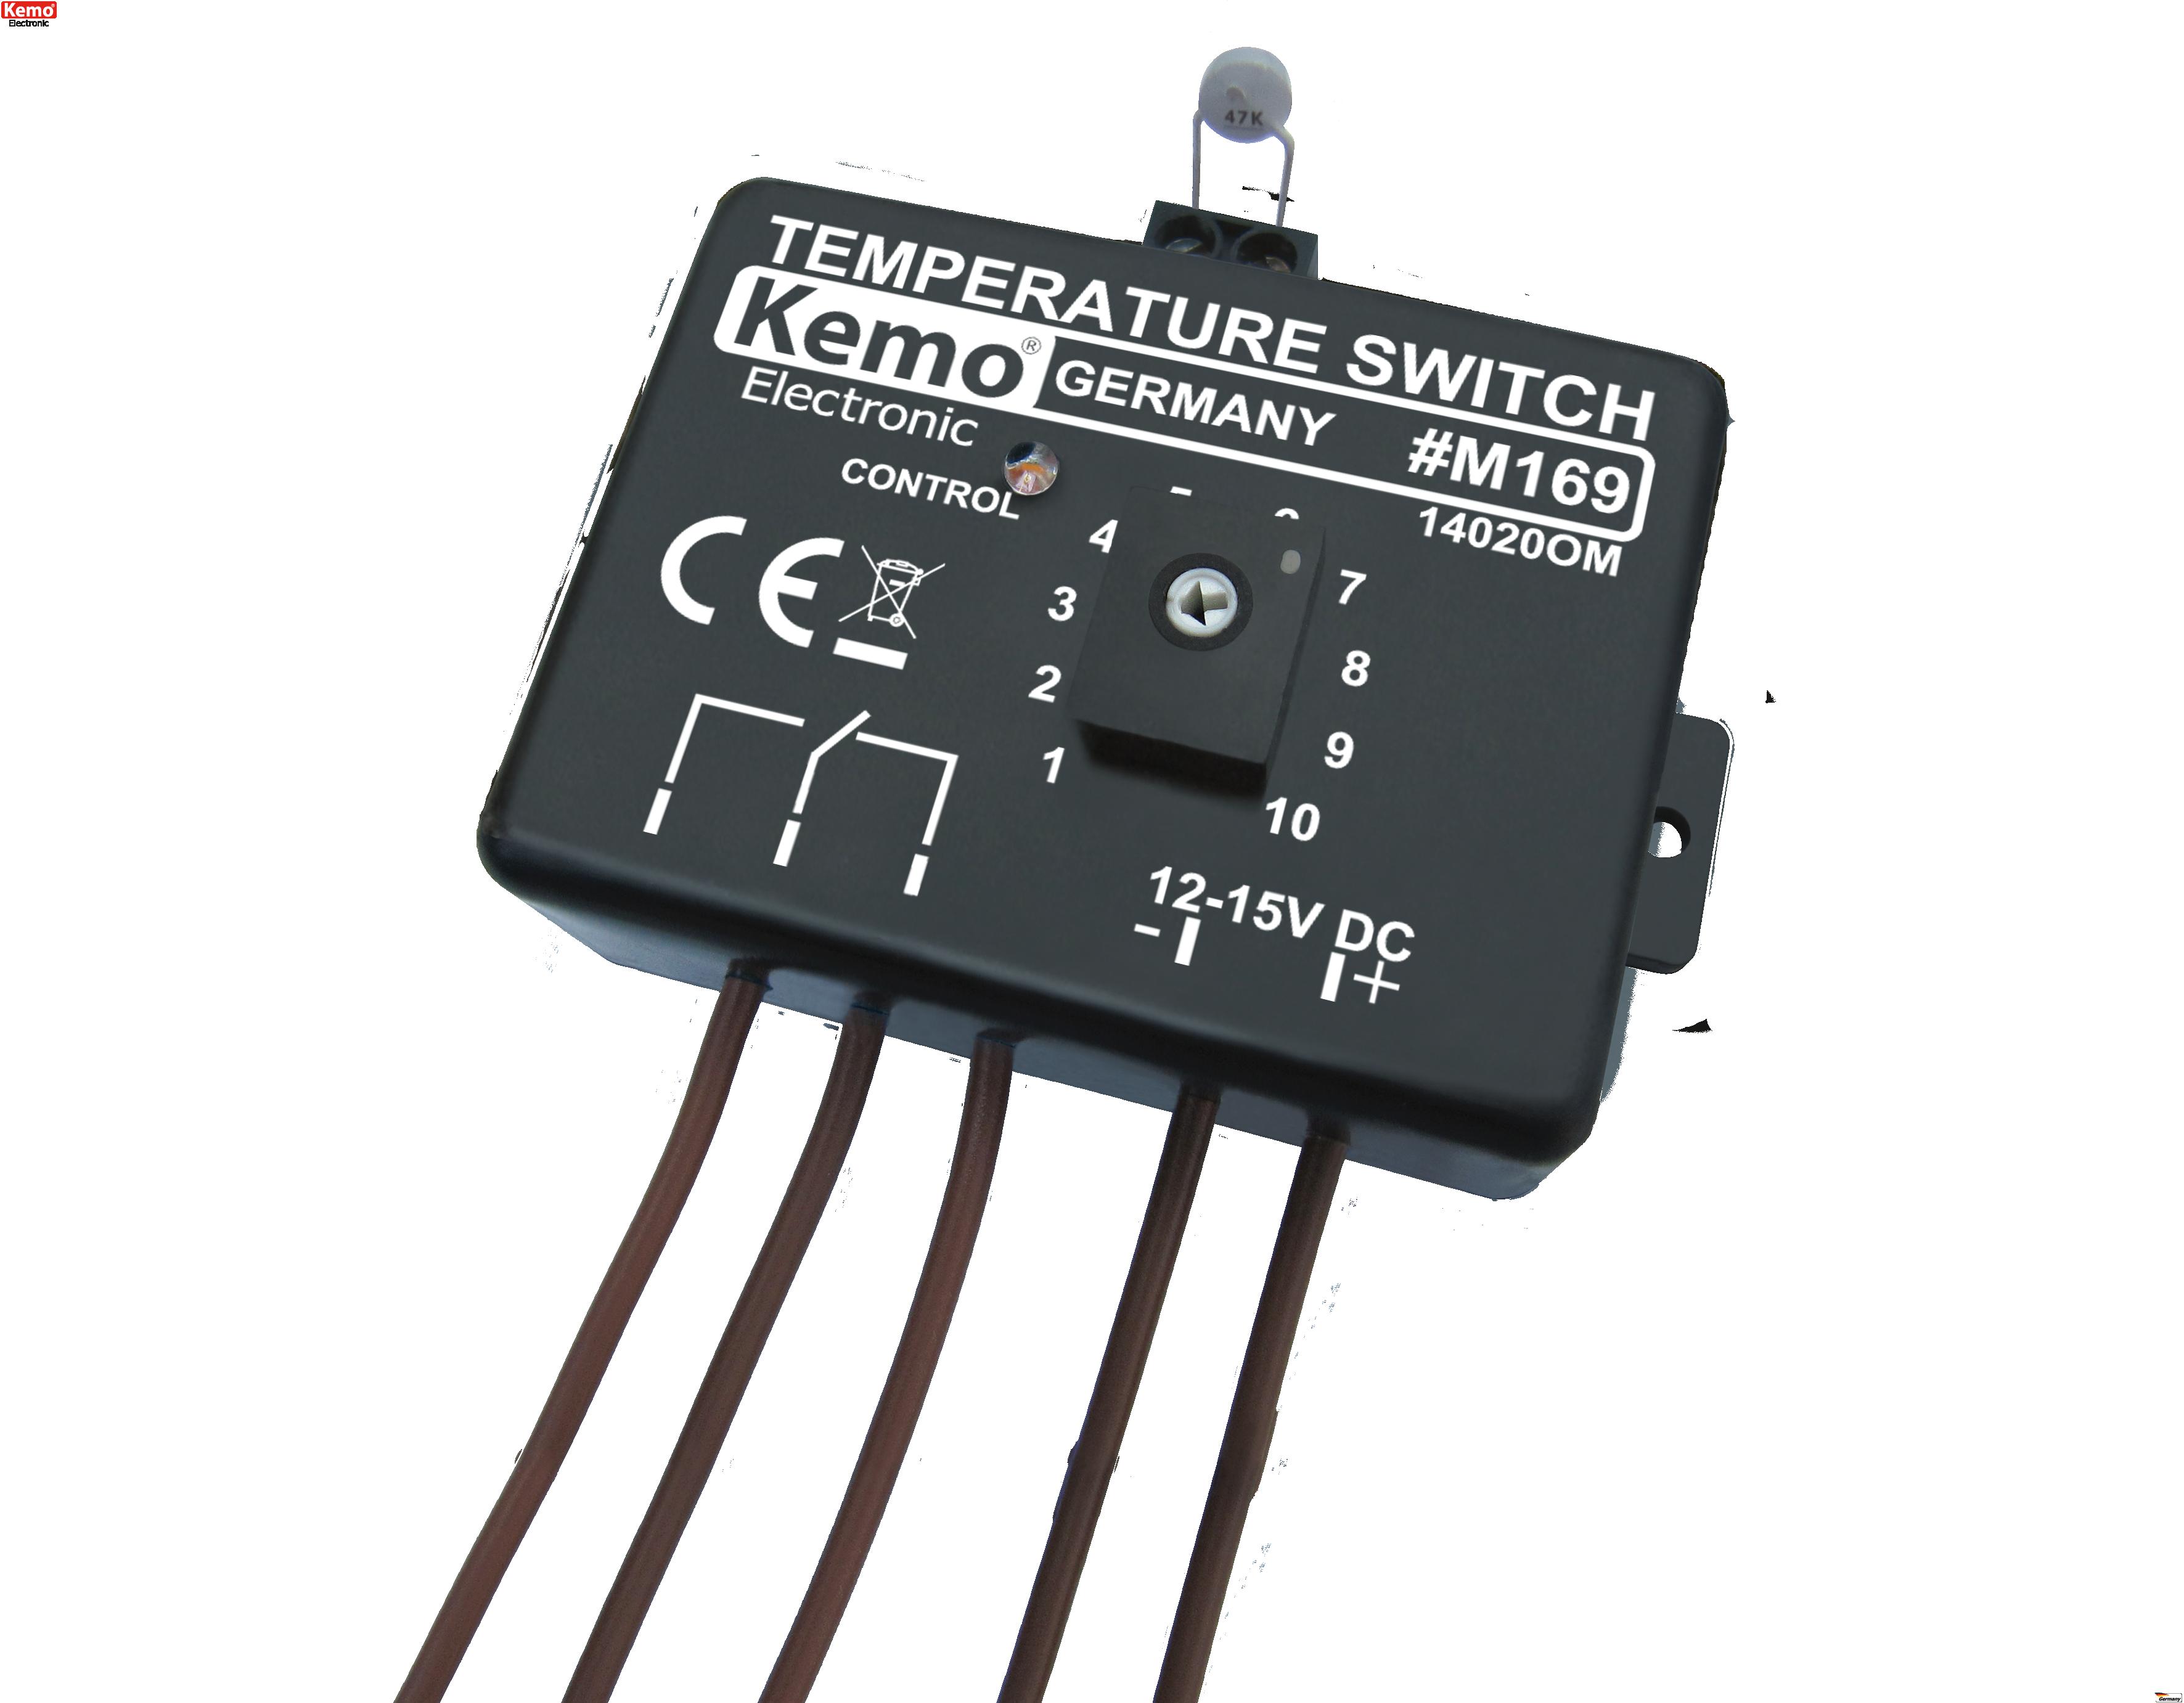 termostato autom tico temperatura 0 100 c 12 v dc m169